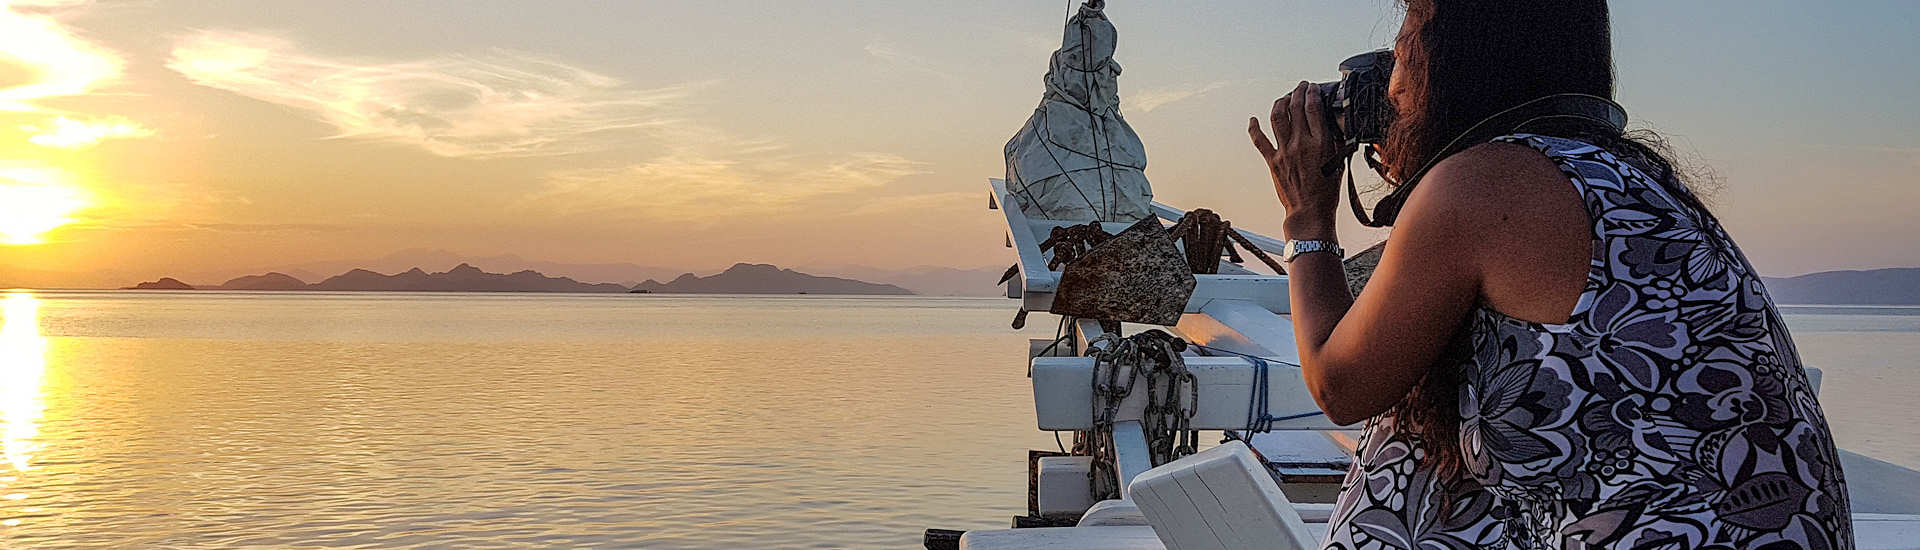 Sonnenaufgang in Komodo mit Yani, Käpt'n, Köchin und gute Seele an Bord